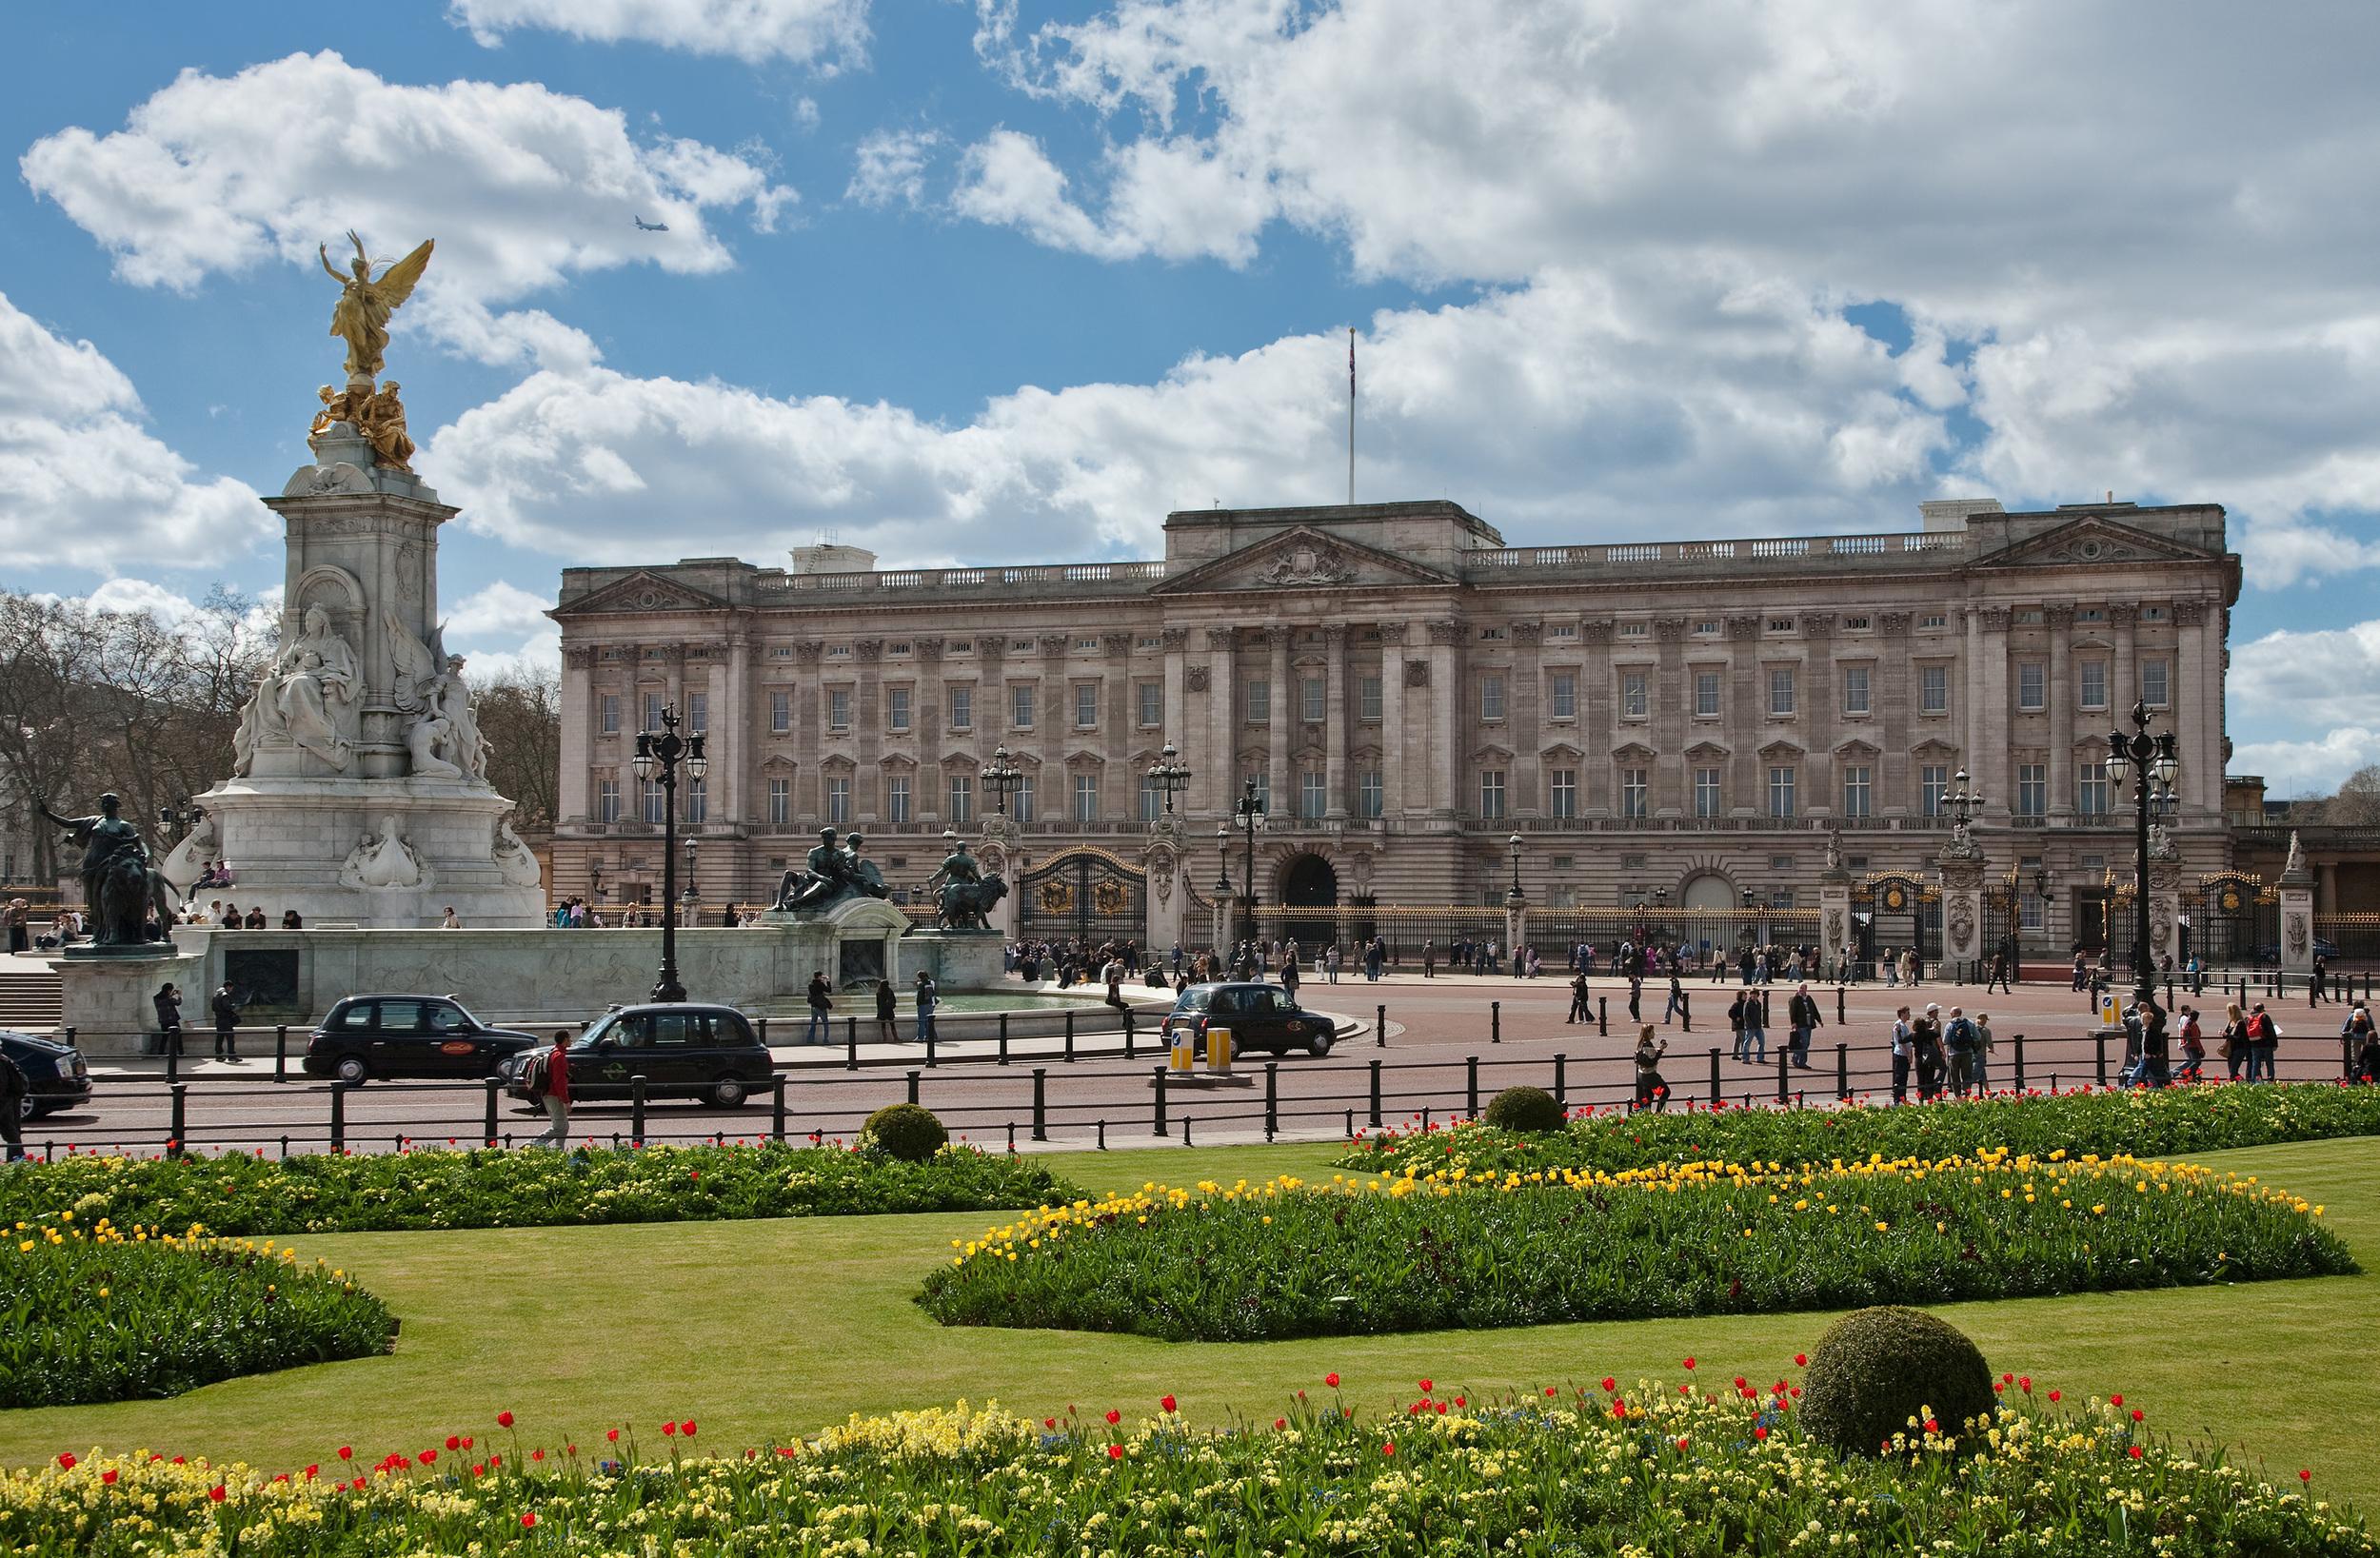 Buckingham_Palace.jpg